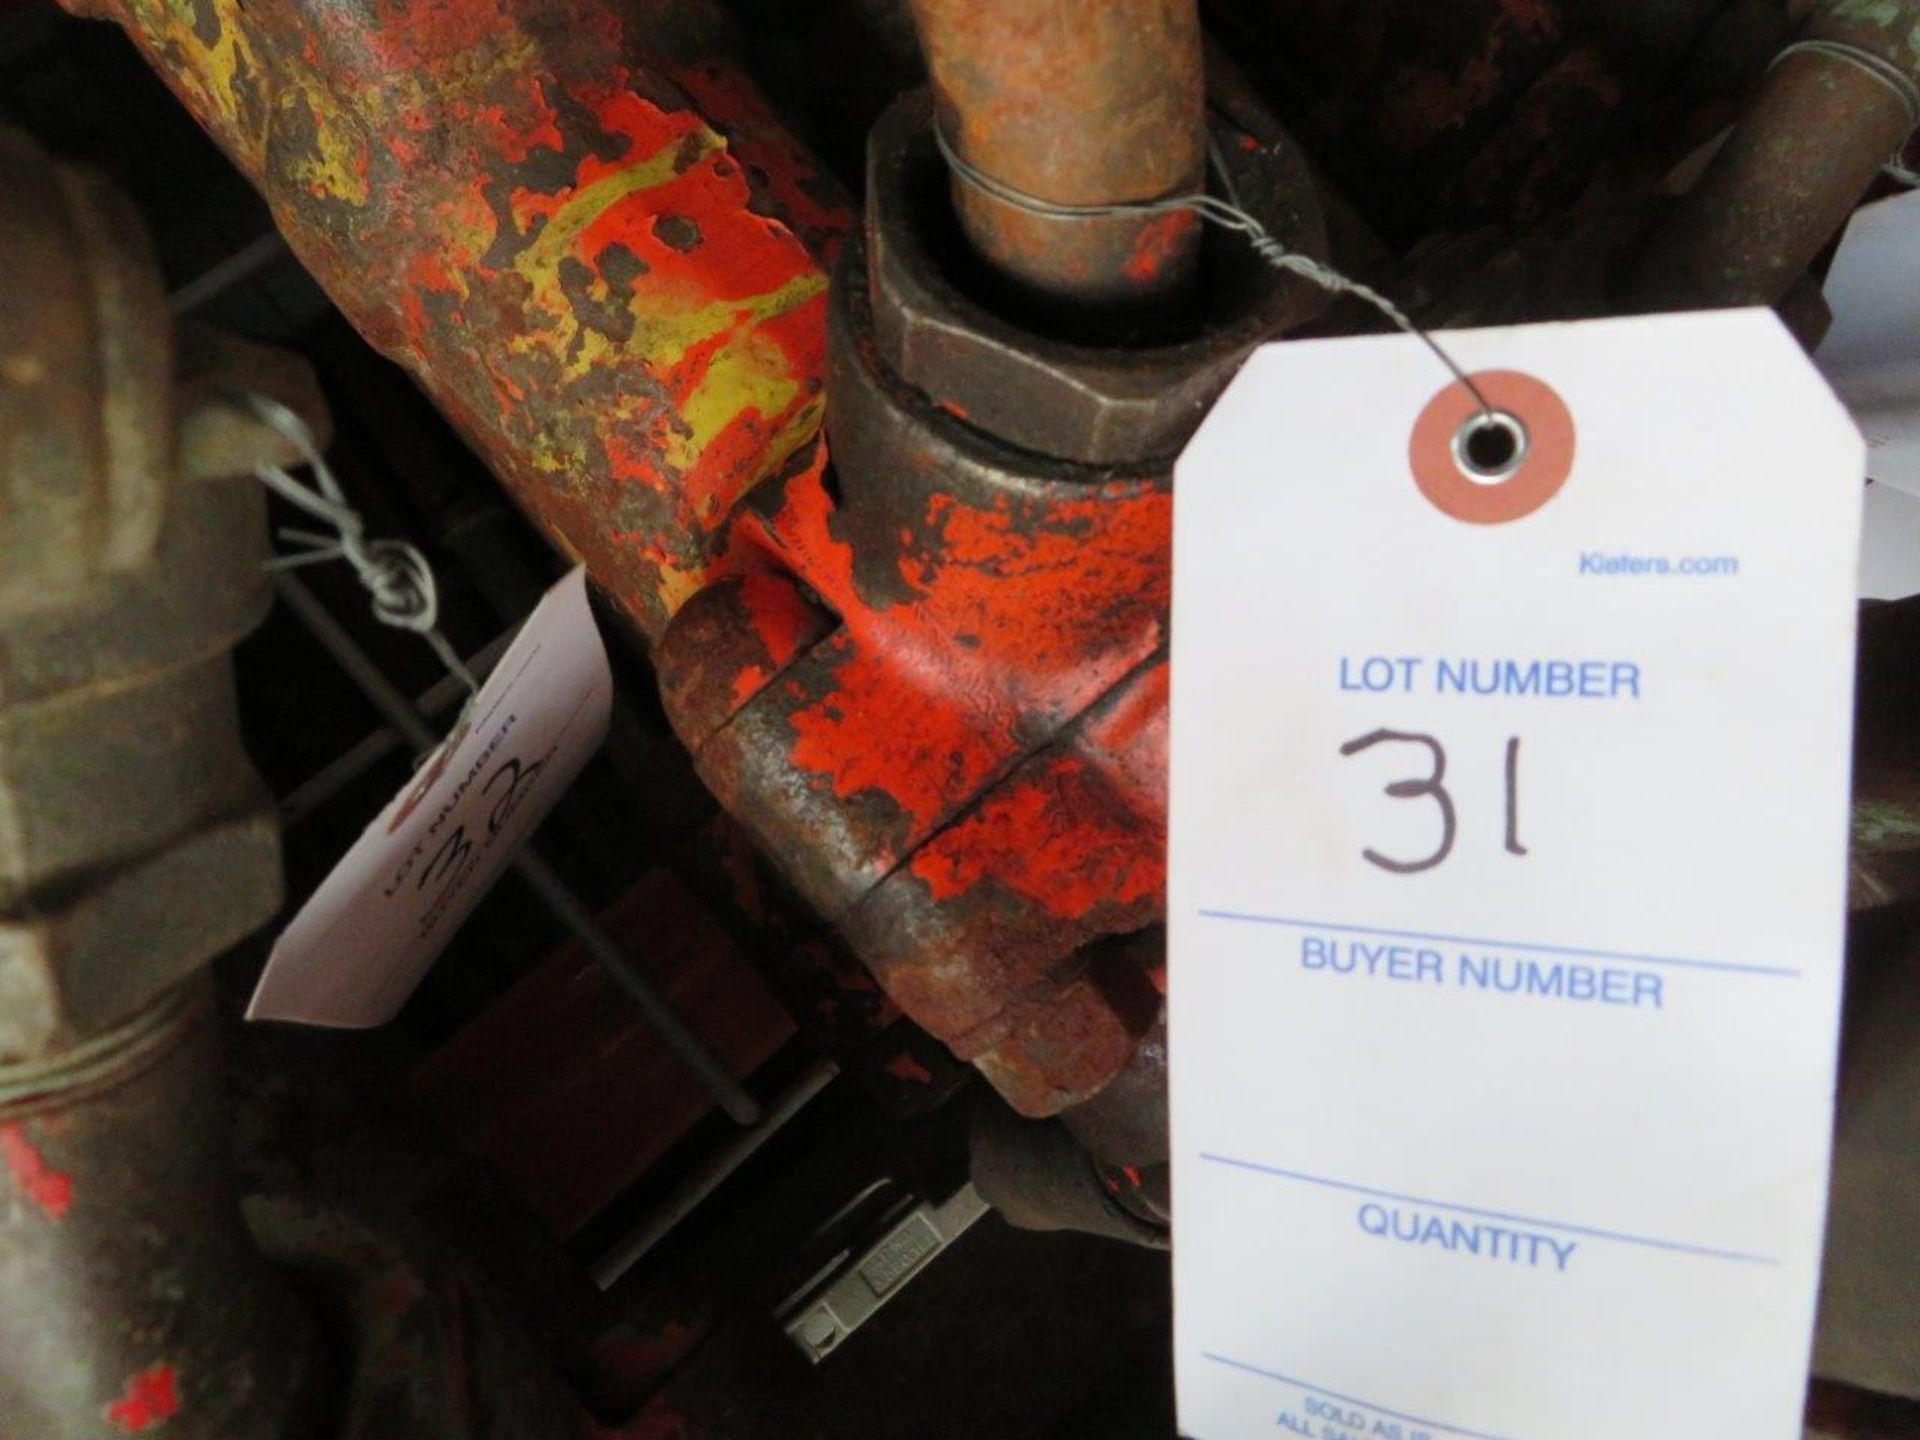 Lot 31 - (1) Central Pneumatic Jack Hammer